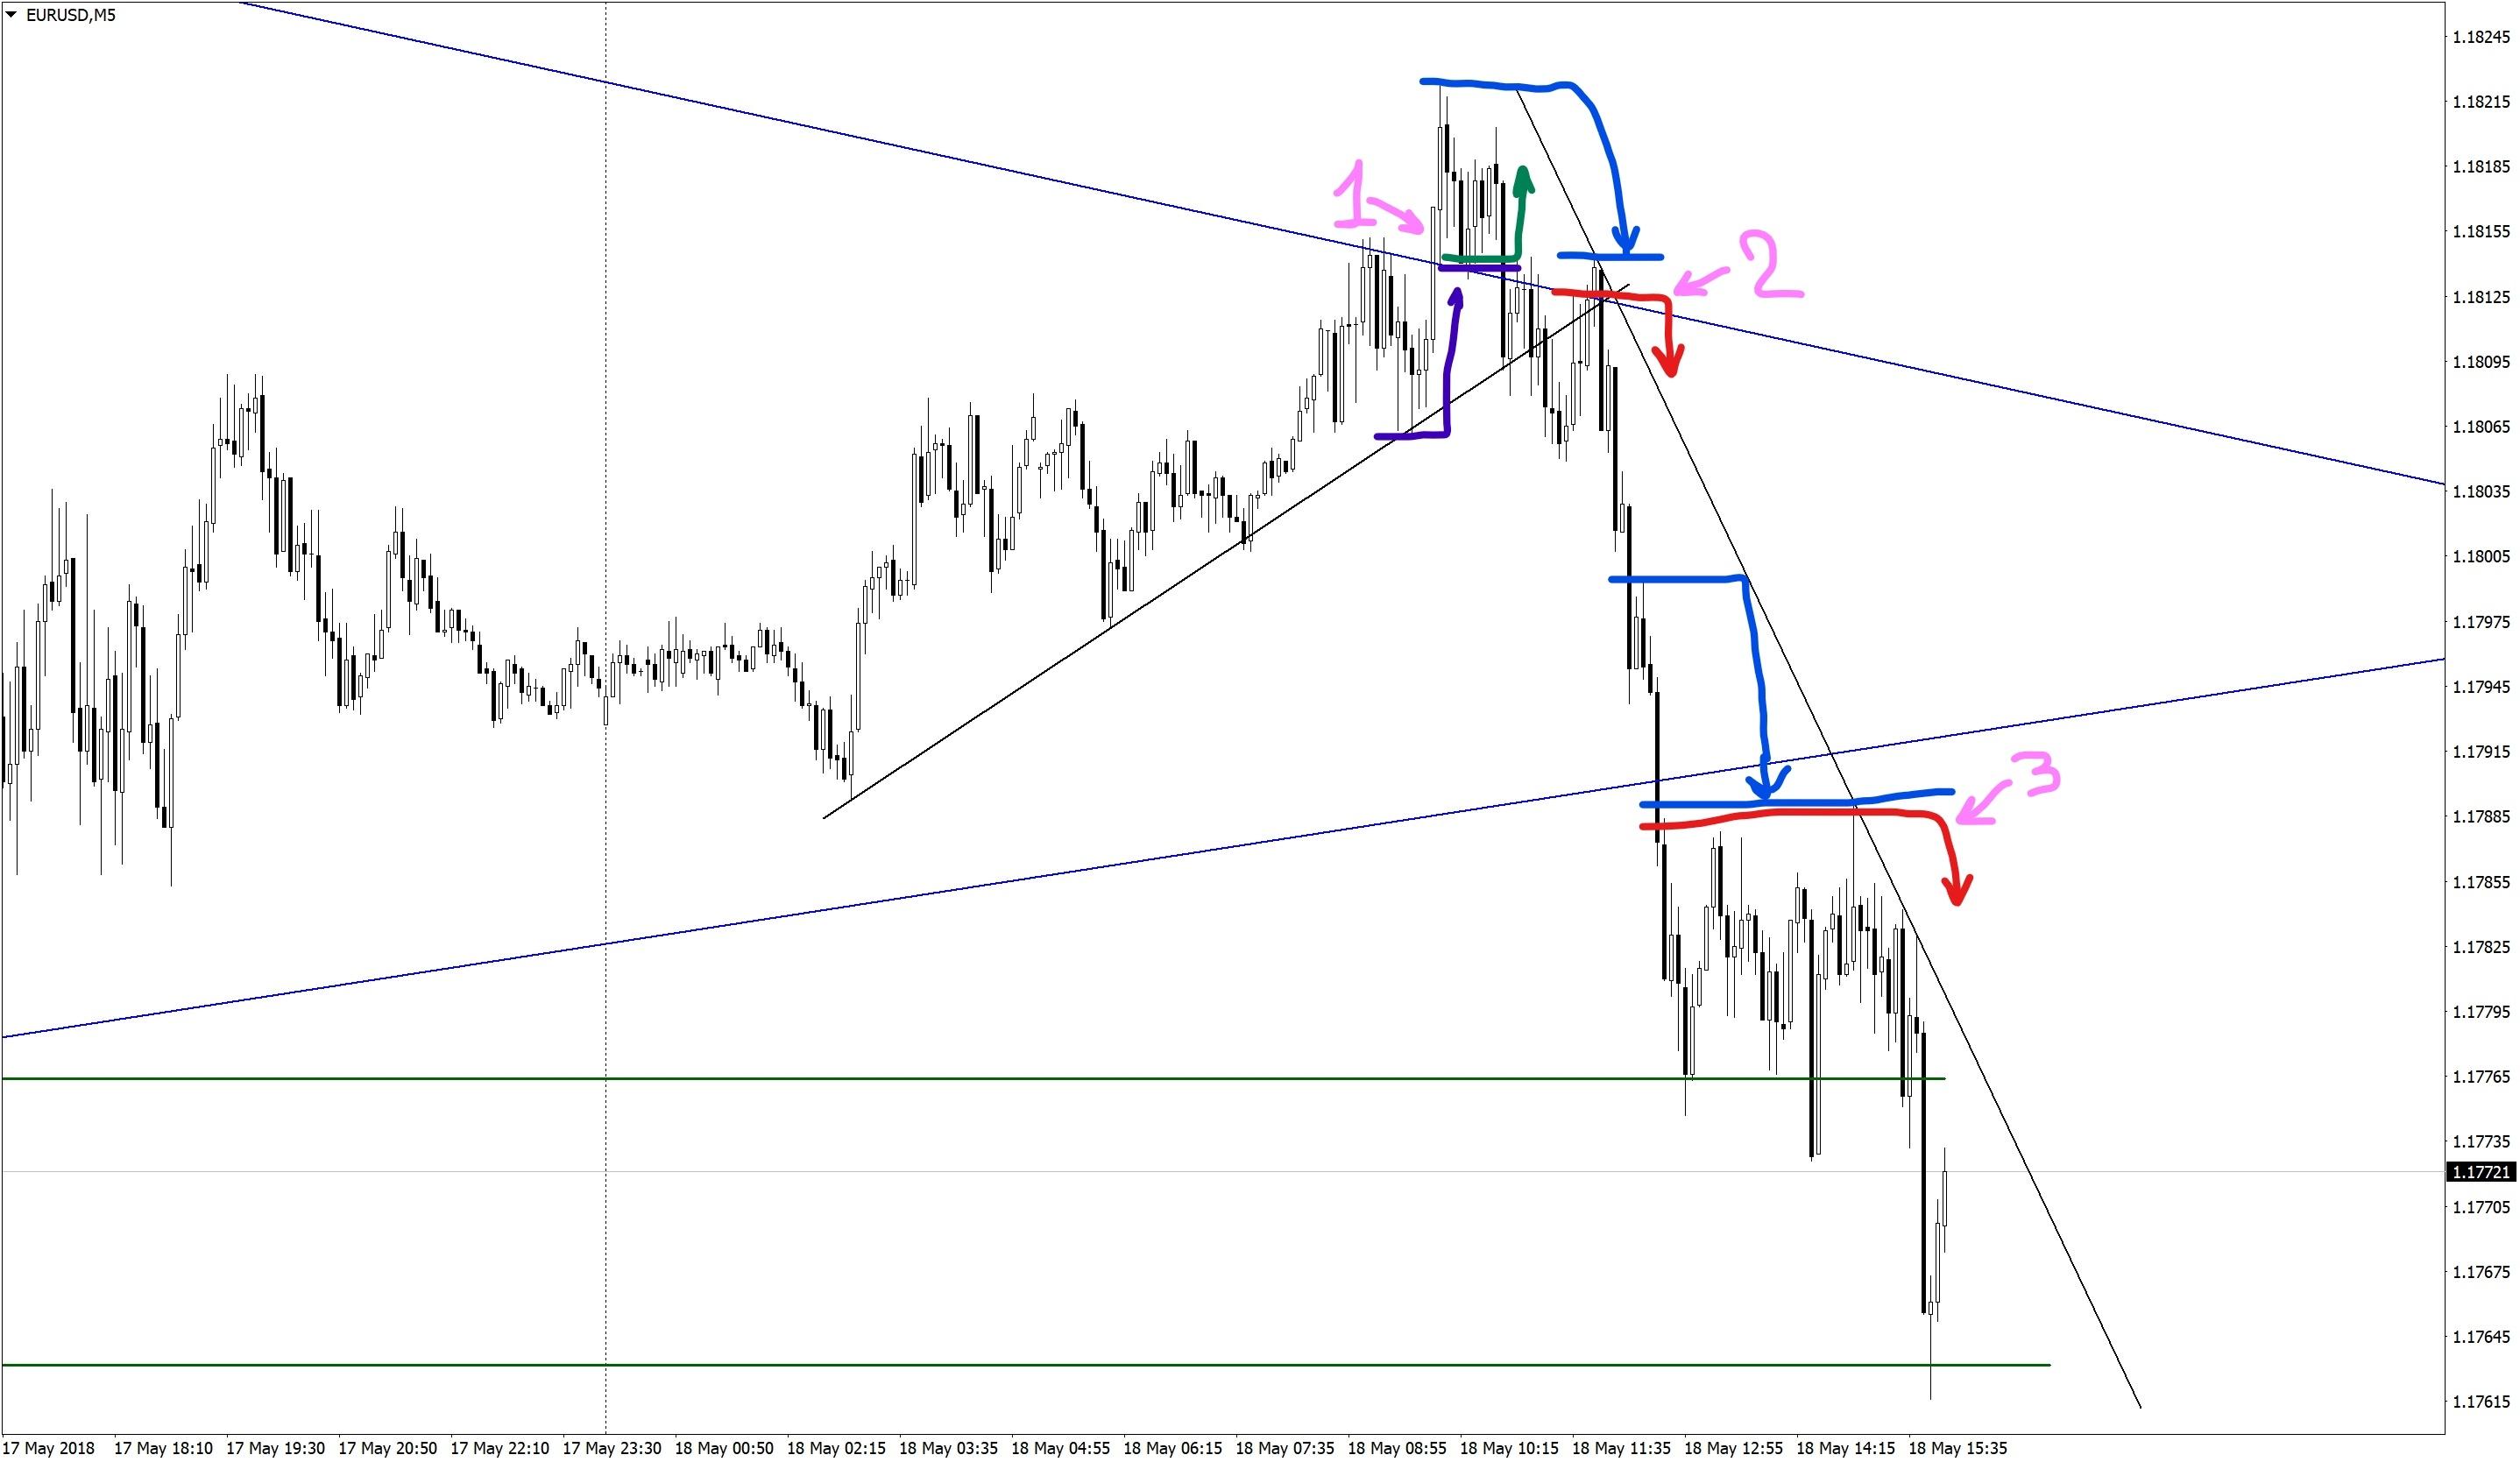 False triangle breakdown on the EURUSDM pair